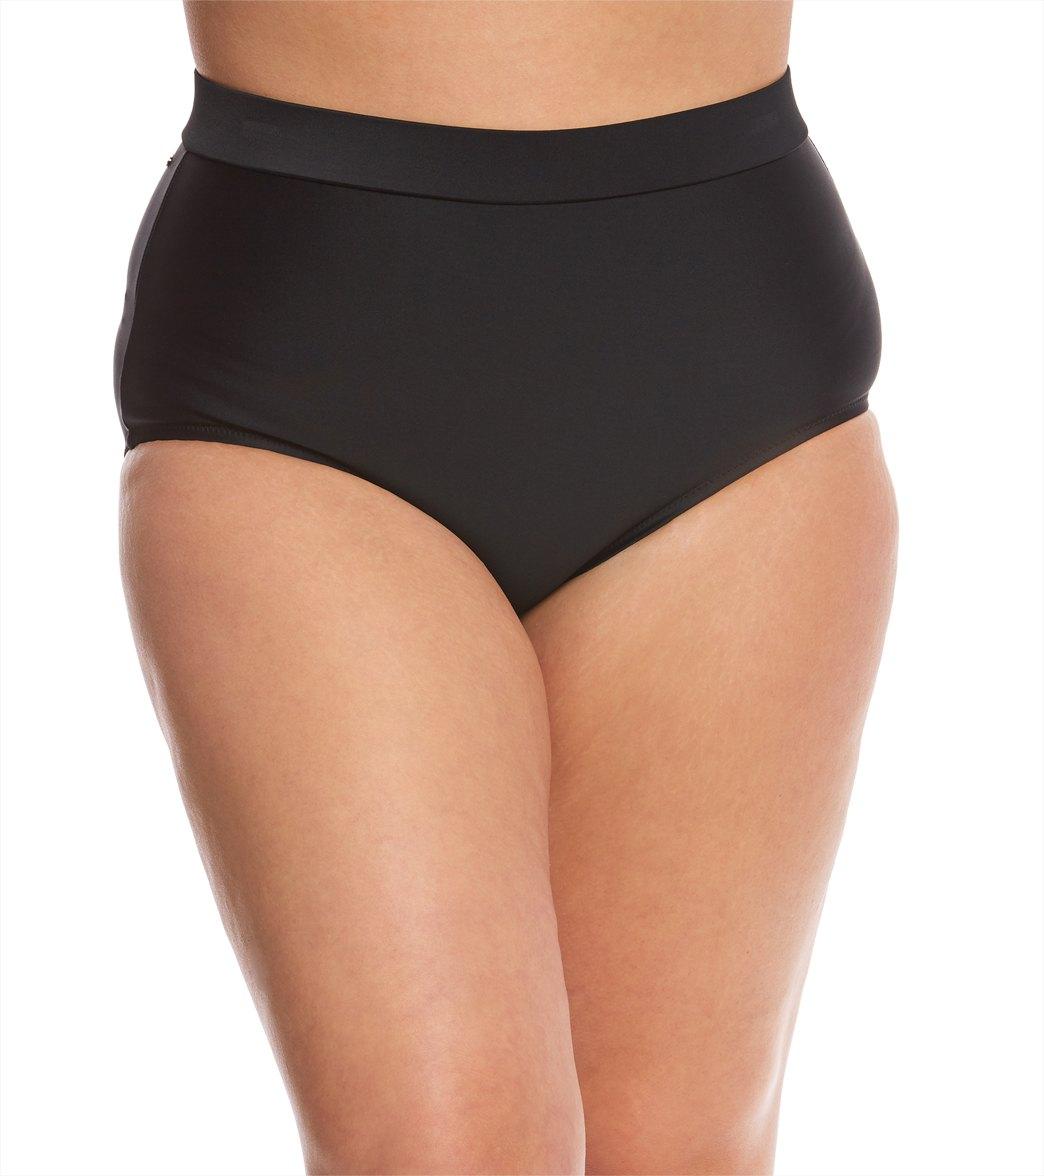 f1d6376750c Raisins Curve Plus Size Flamingo Solids Island High Waist Bikini Bottom at  SwimOutlet.com